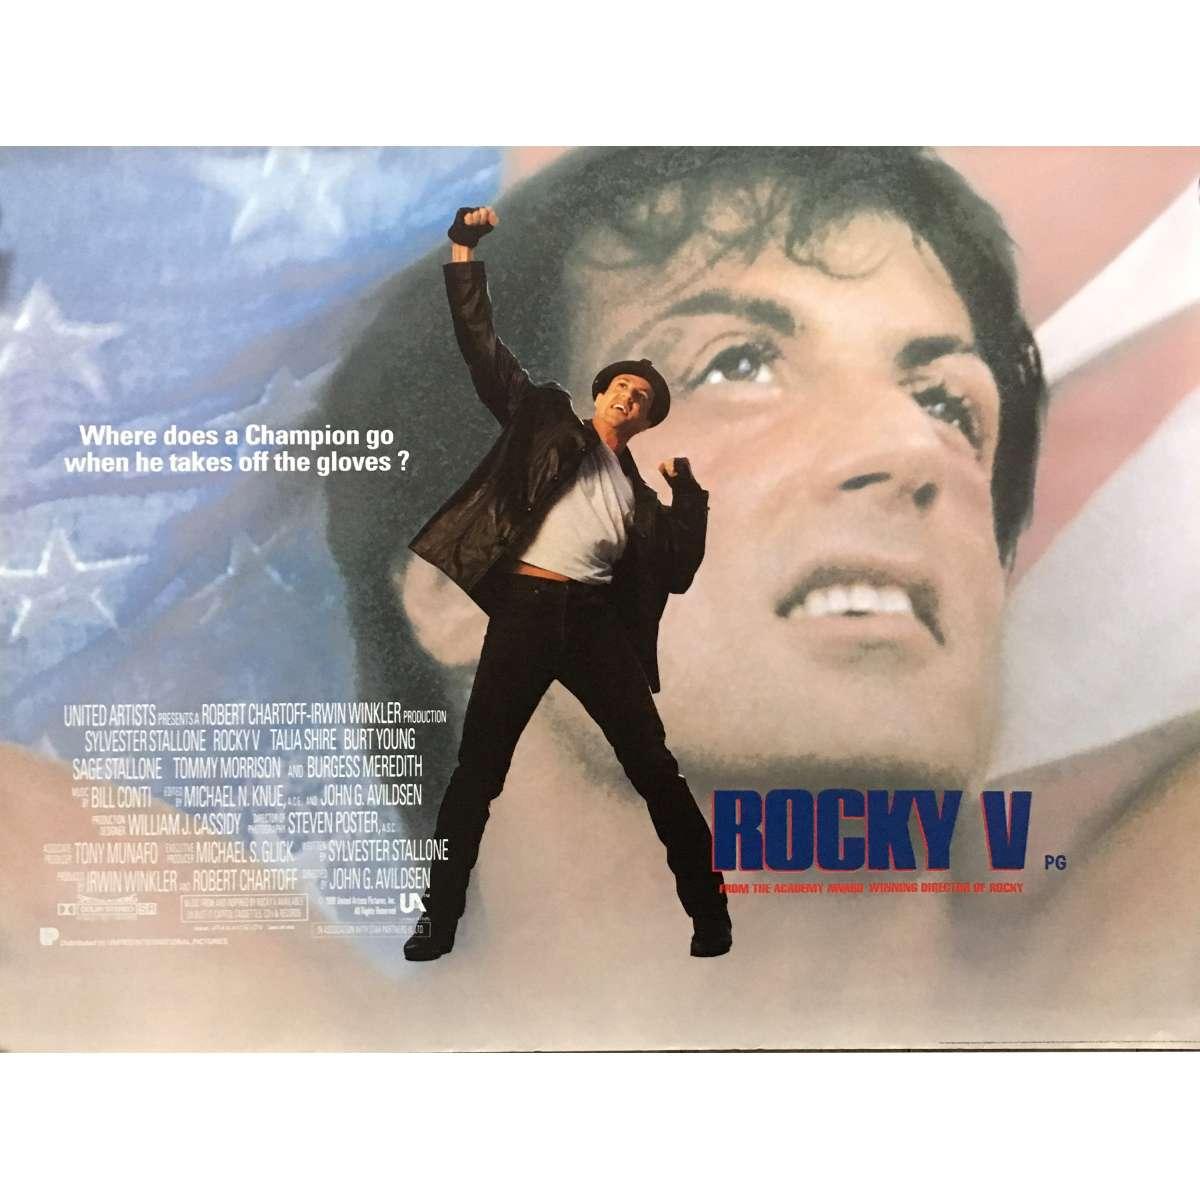 rocky v movie poster 30x40 in 1990 john g avildsen sylverster stallone